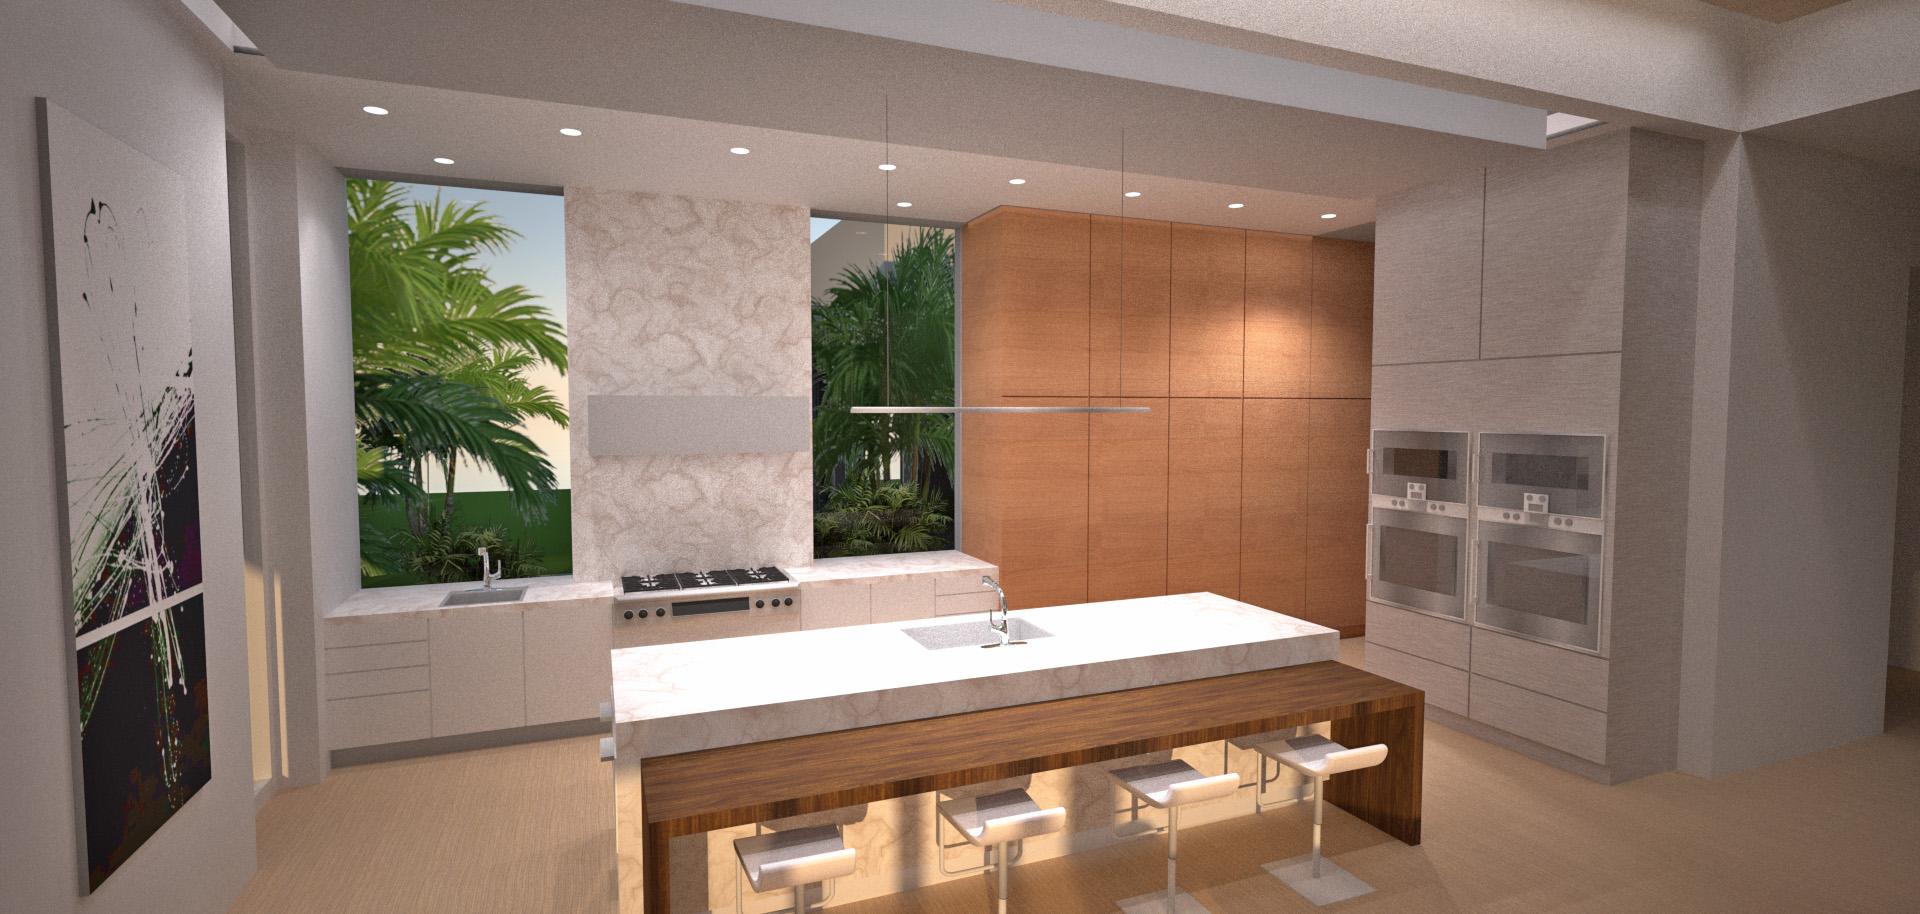 Kitchen 3-model.jpg